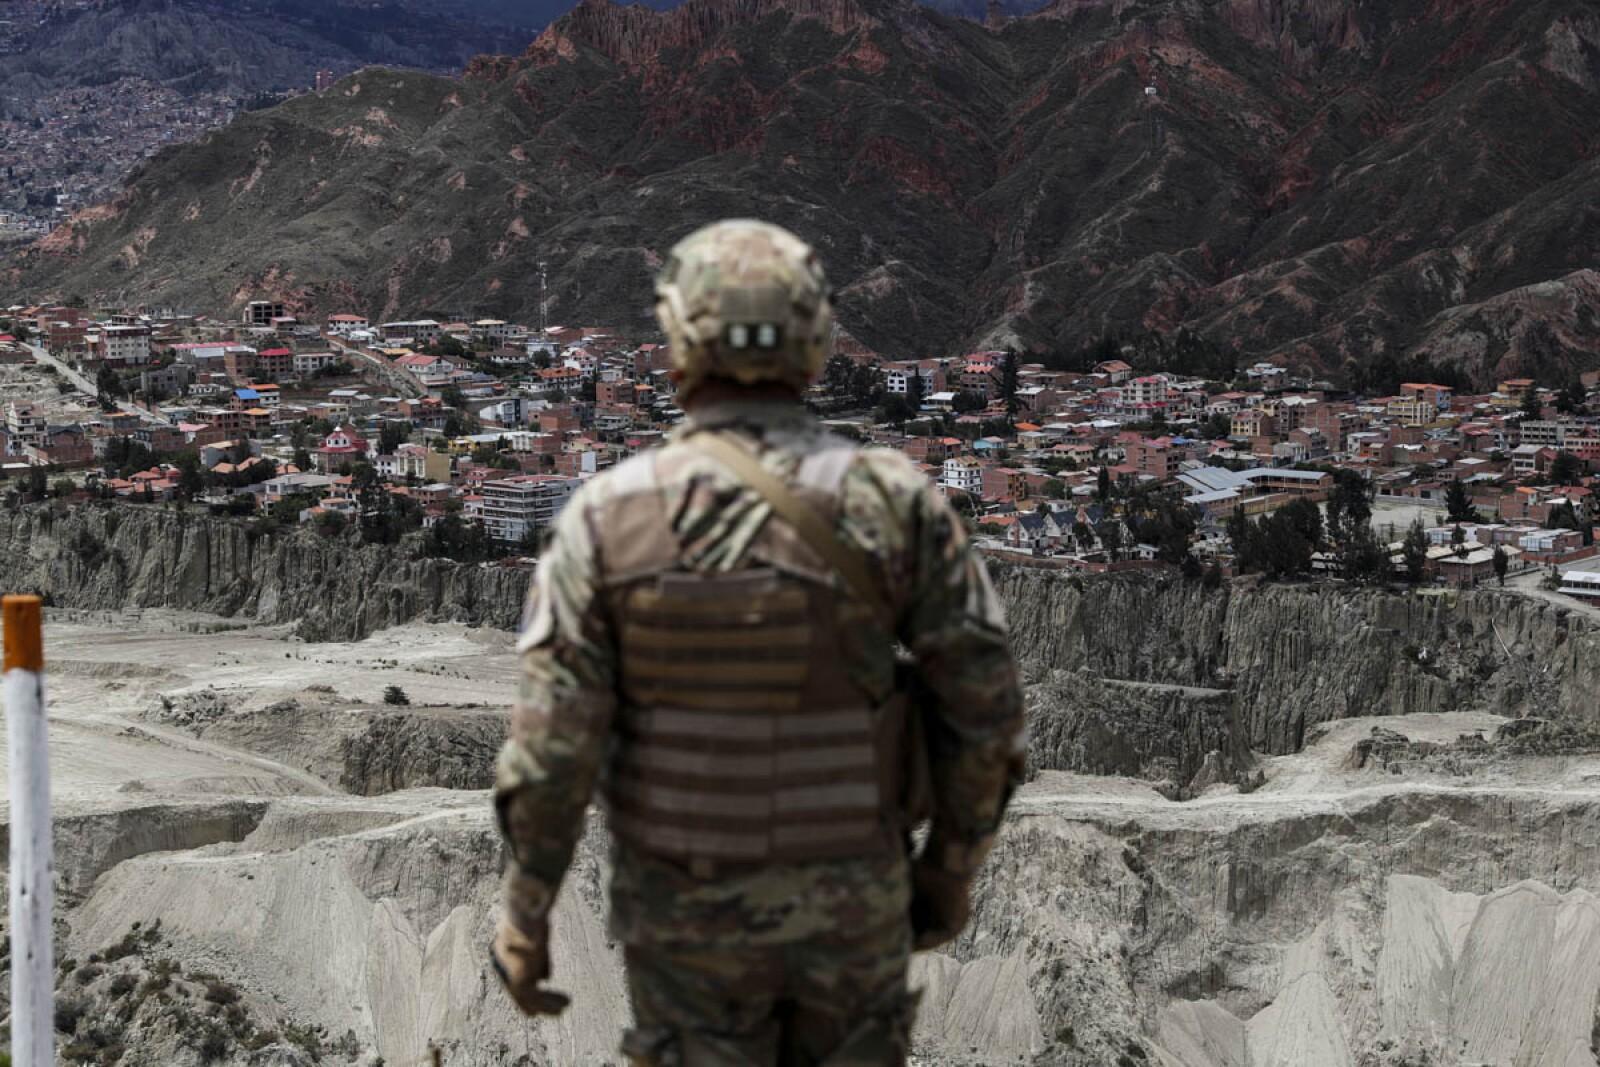 Military members patrol the streets in La Paz